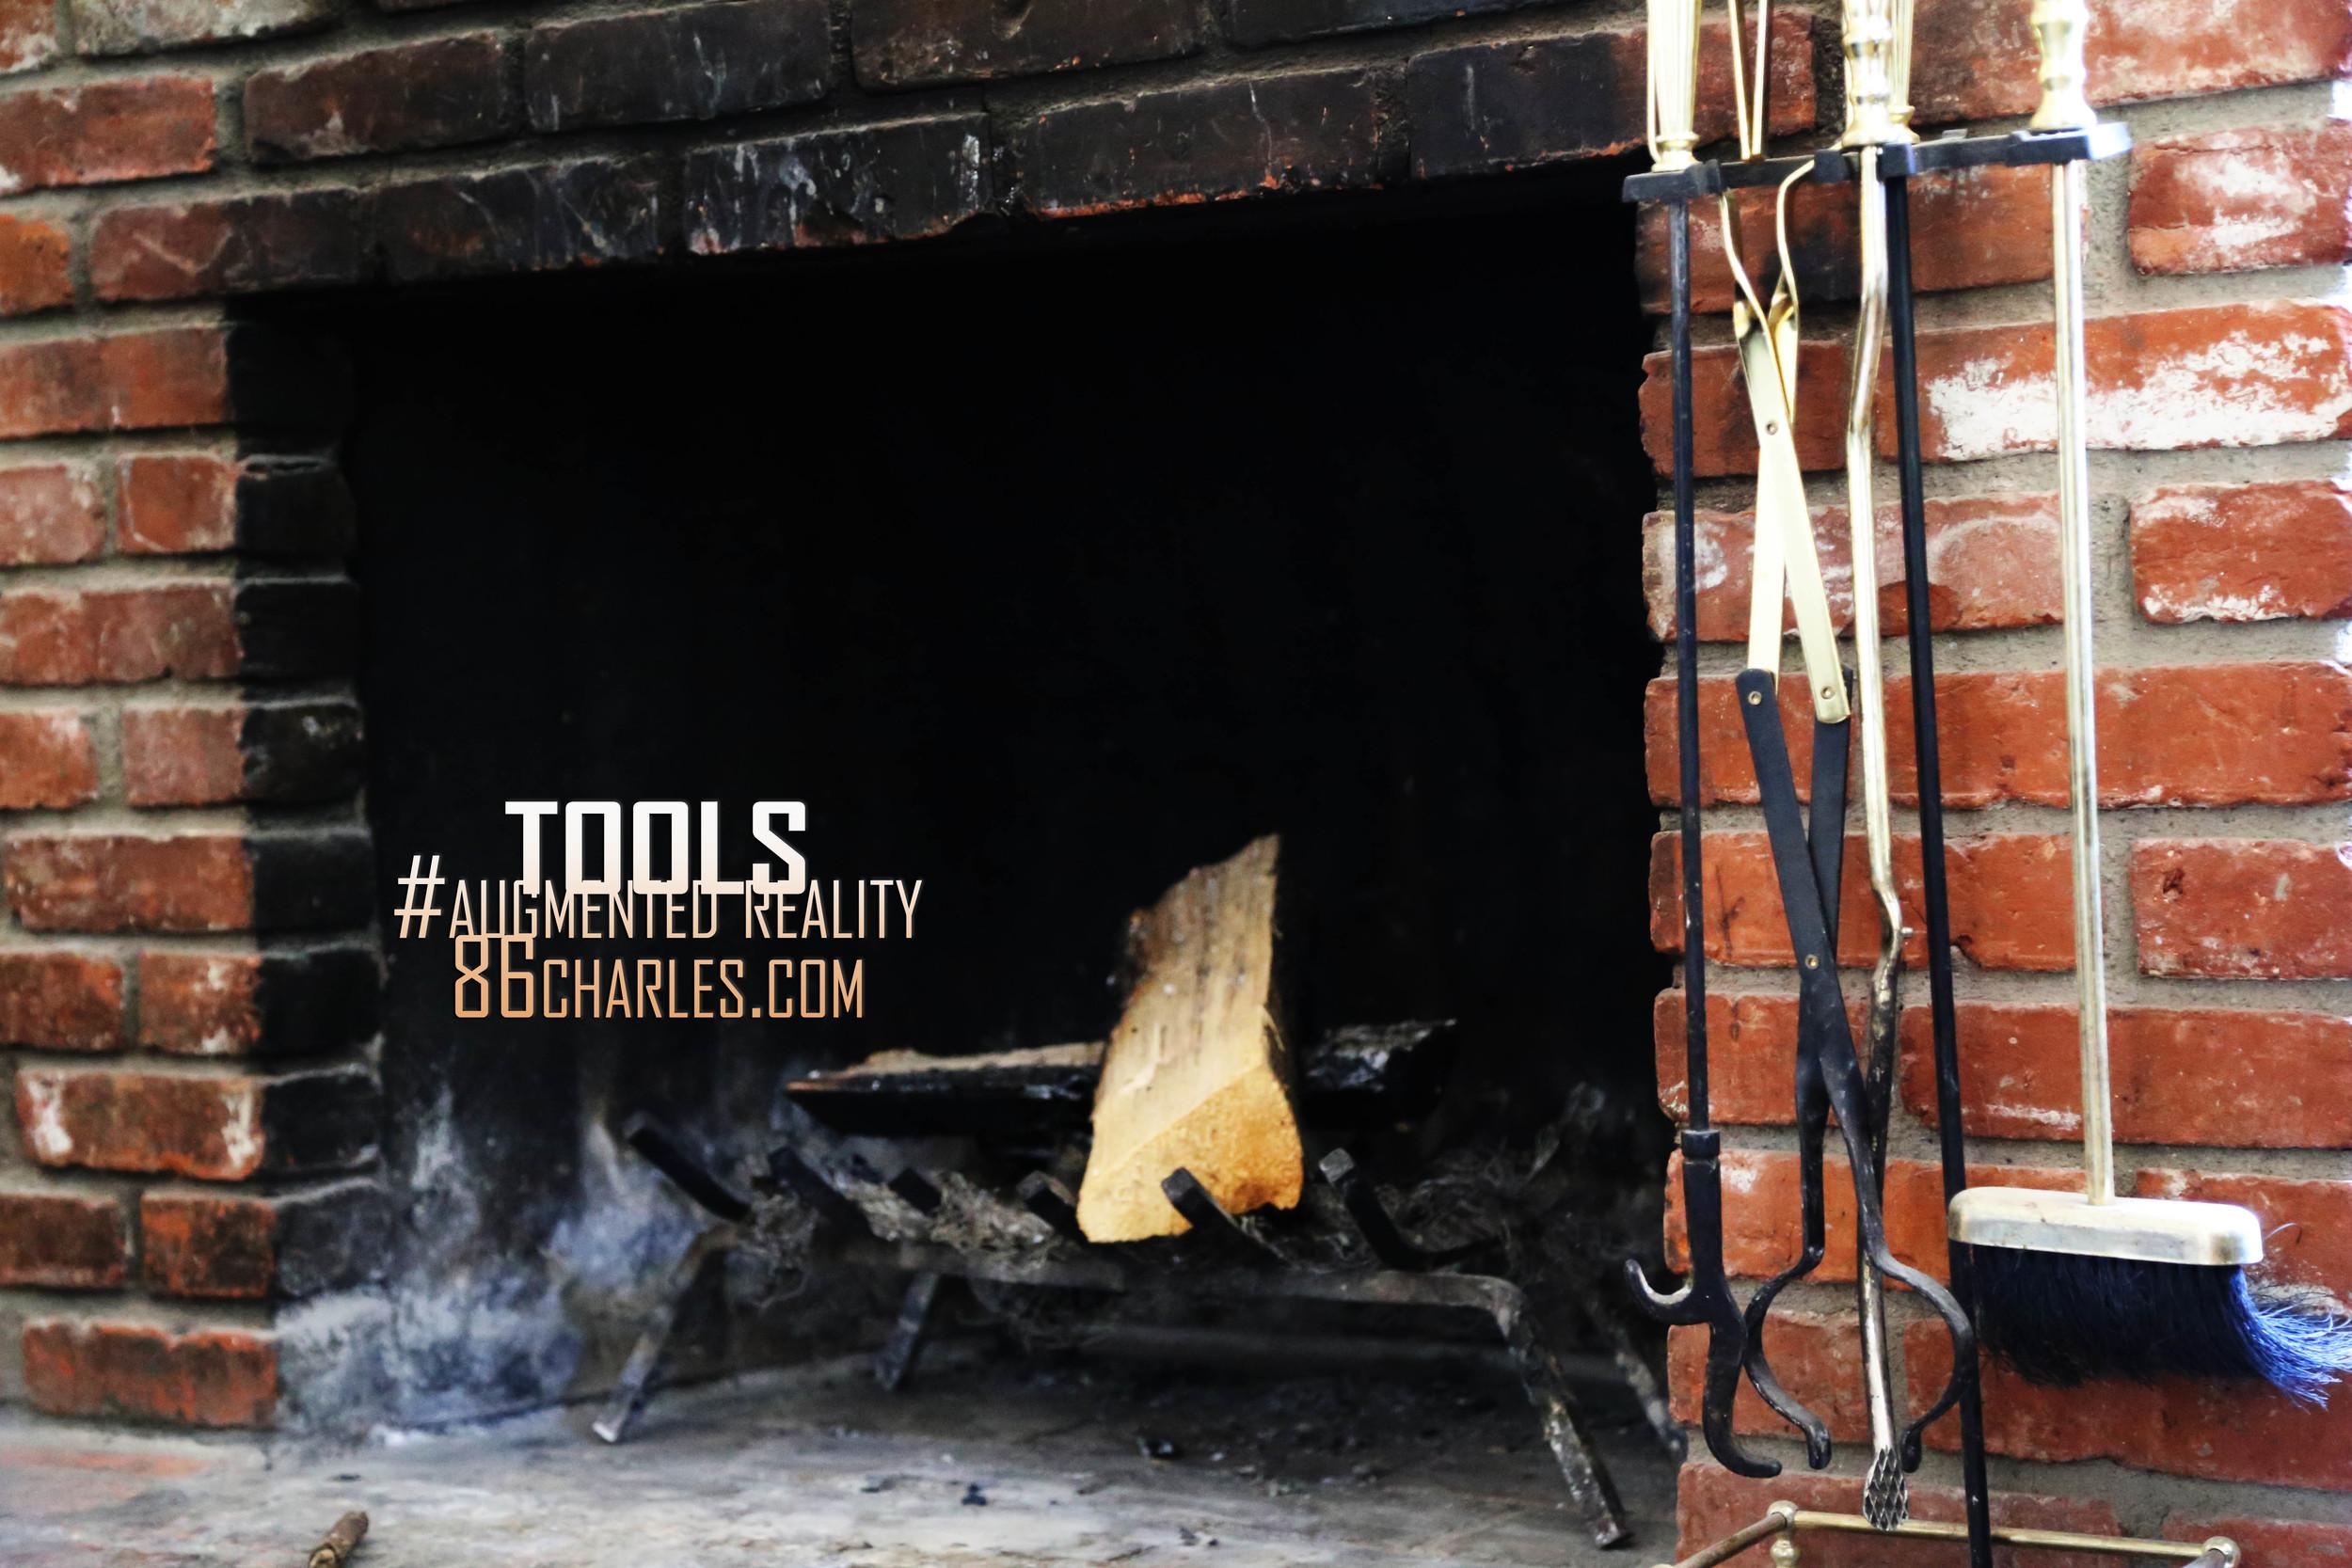 Tools #AugmentedReality